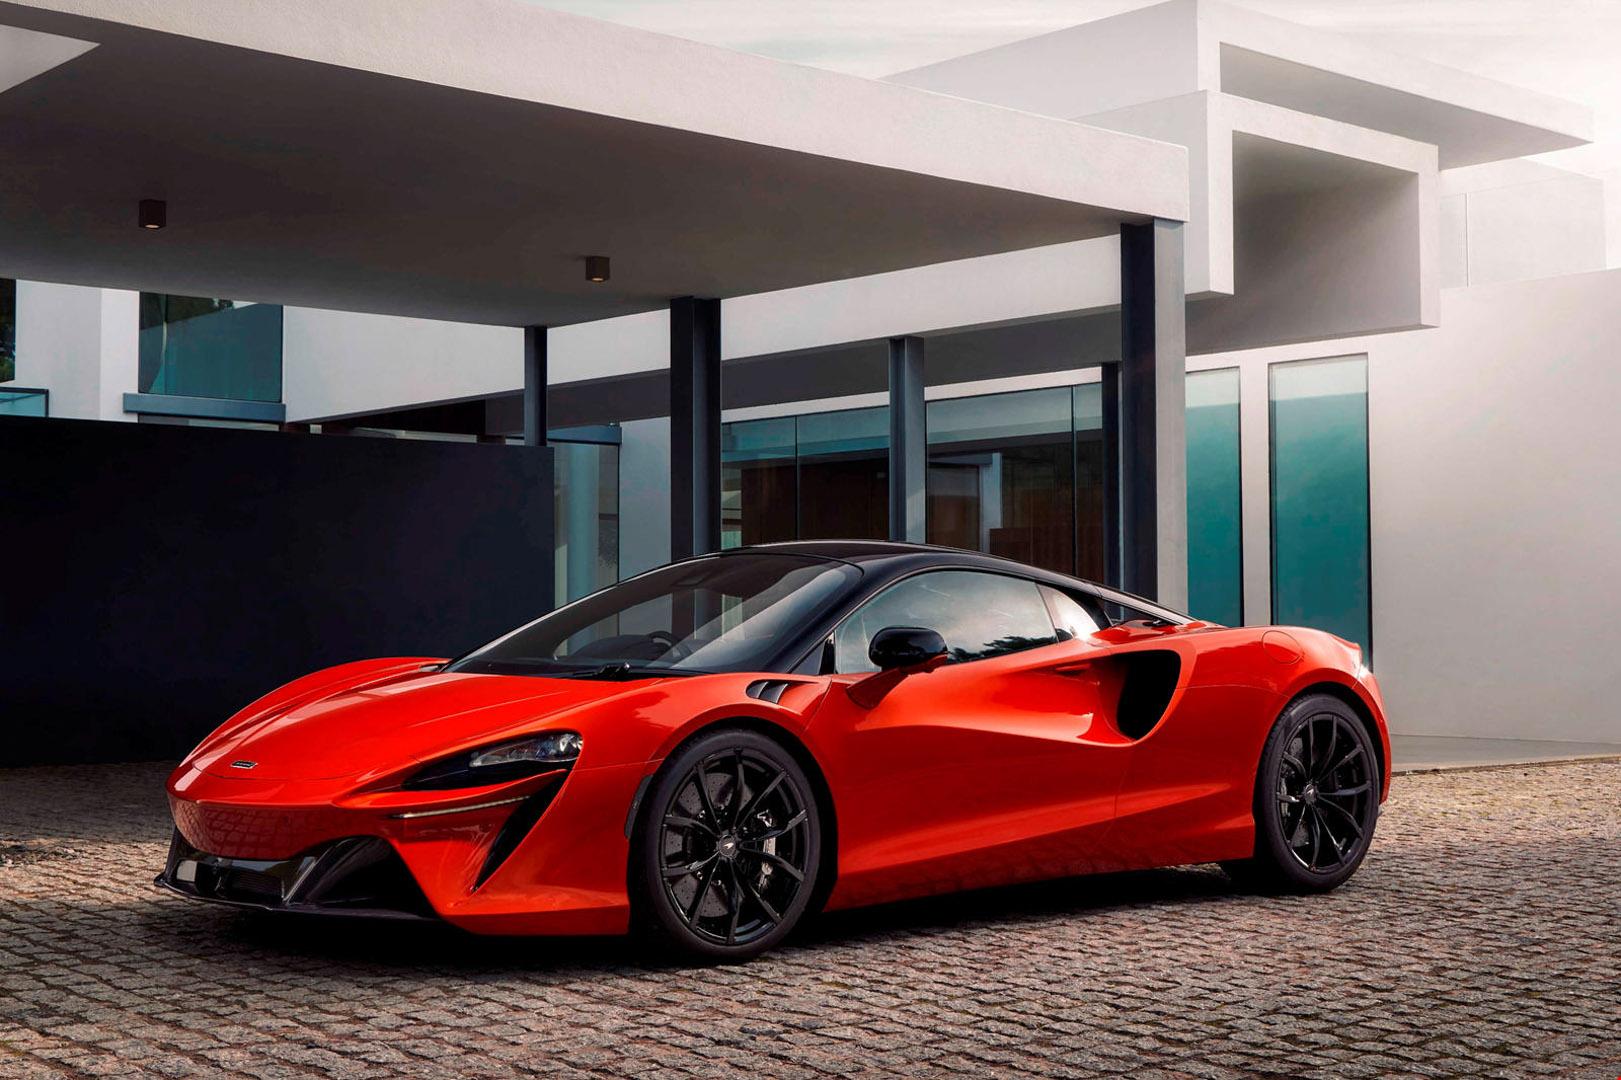 CP-McLaren tiết lộ tên của các mẫu xe mới8.jpg